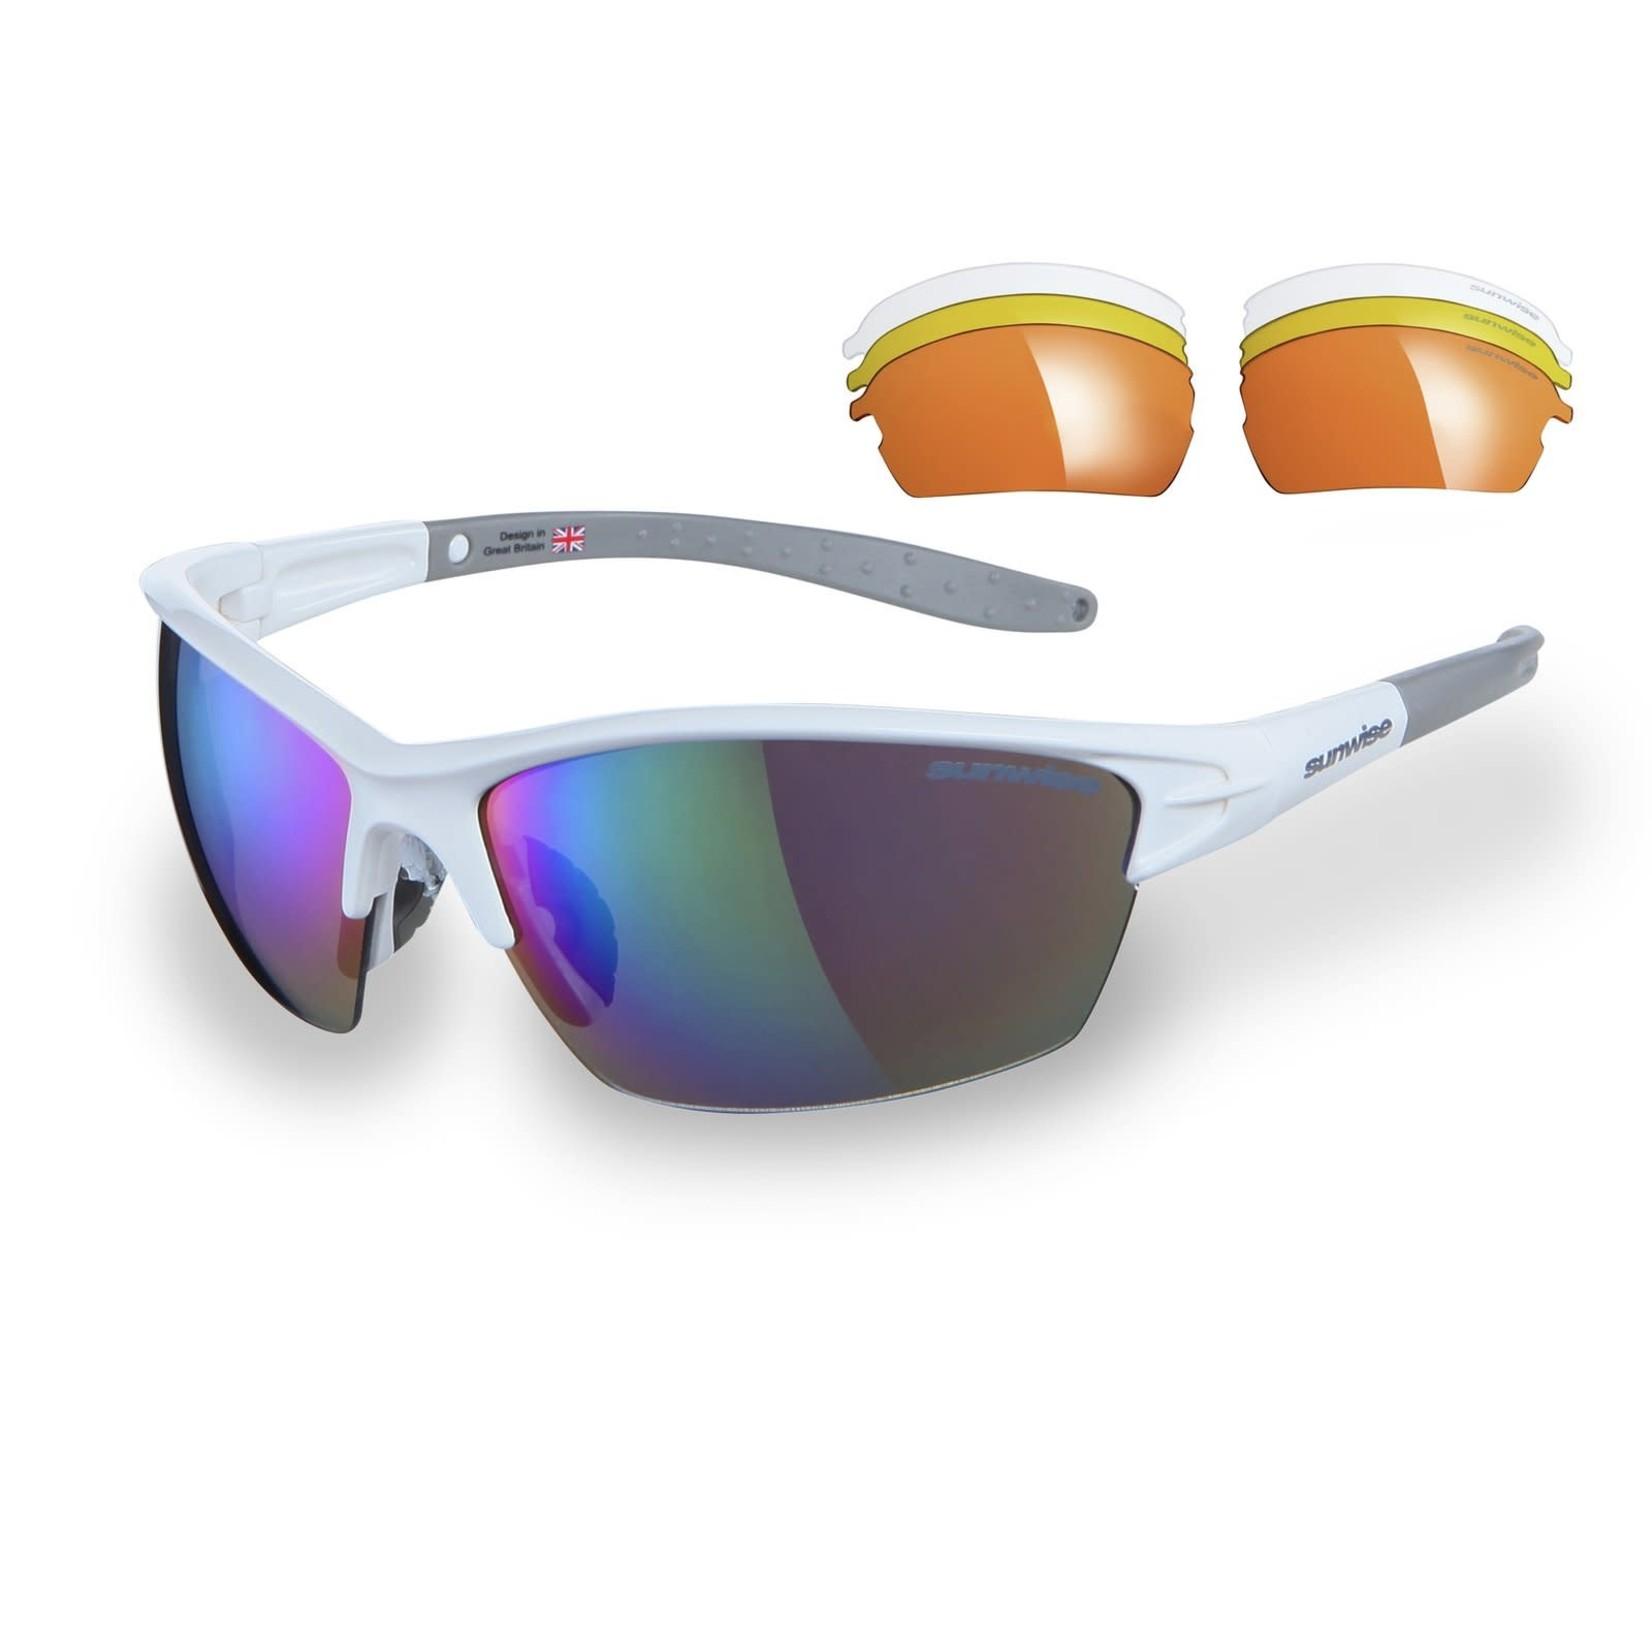 Sunwise Montreal Sunglasses White